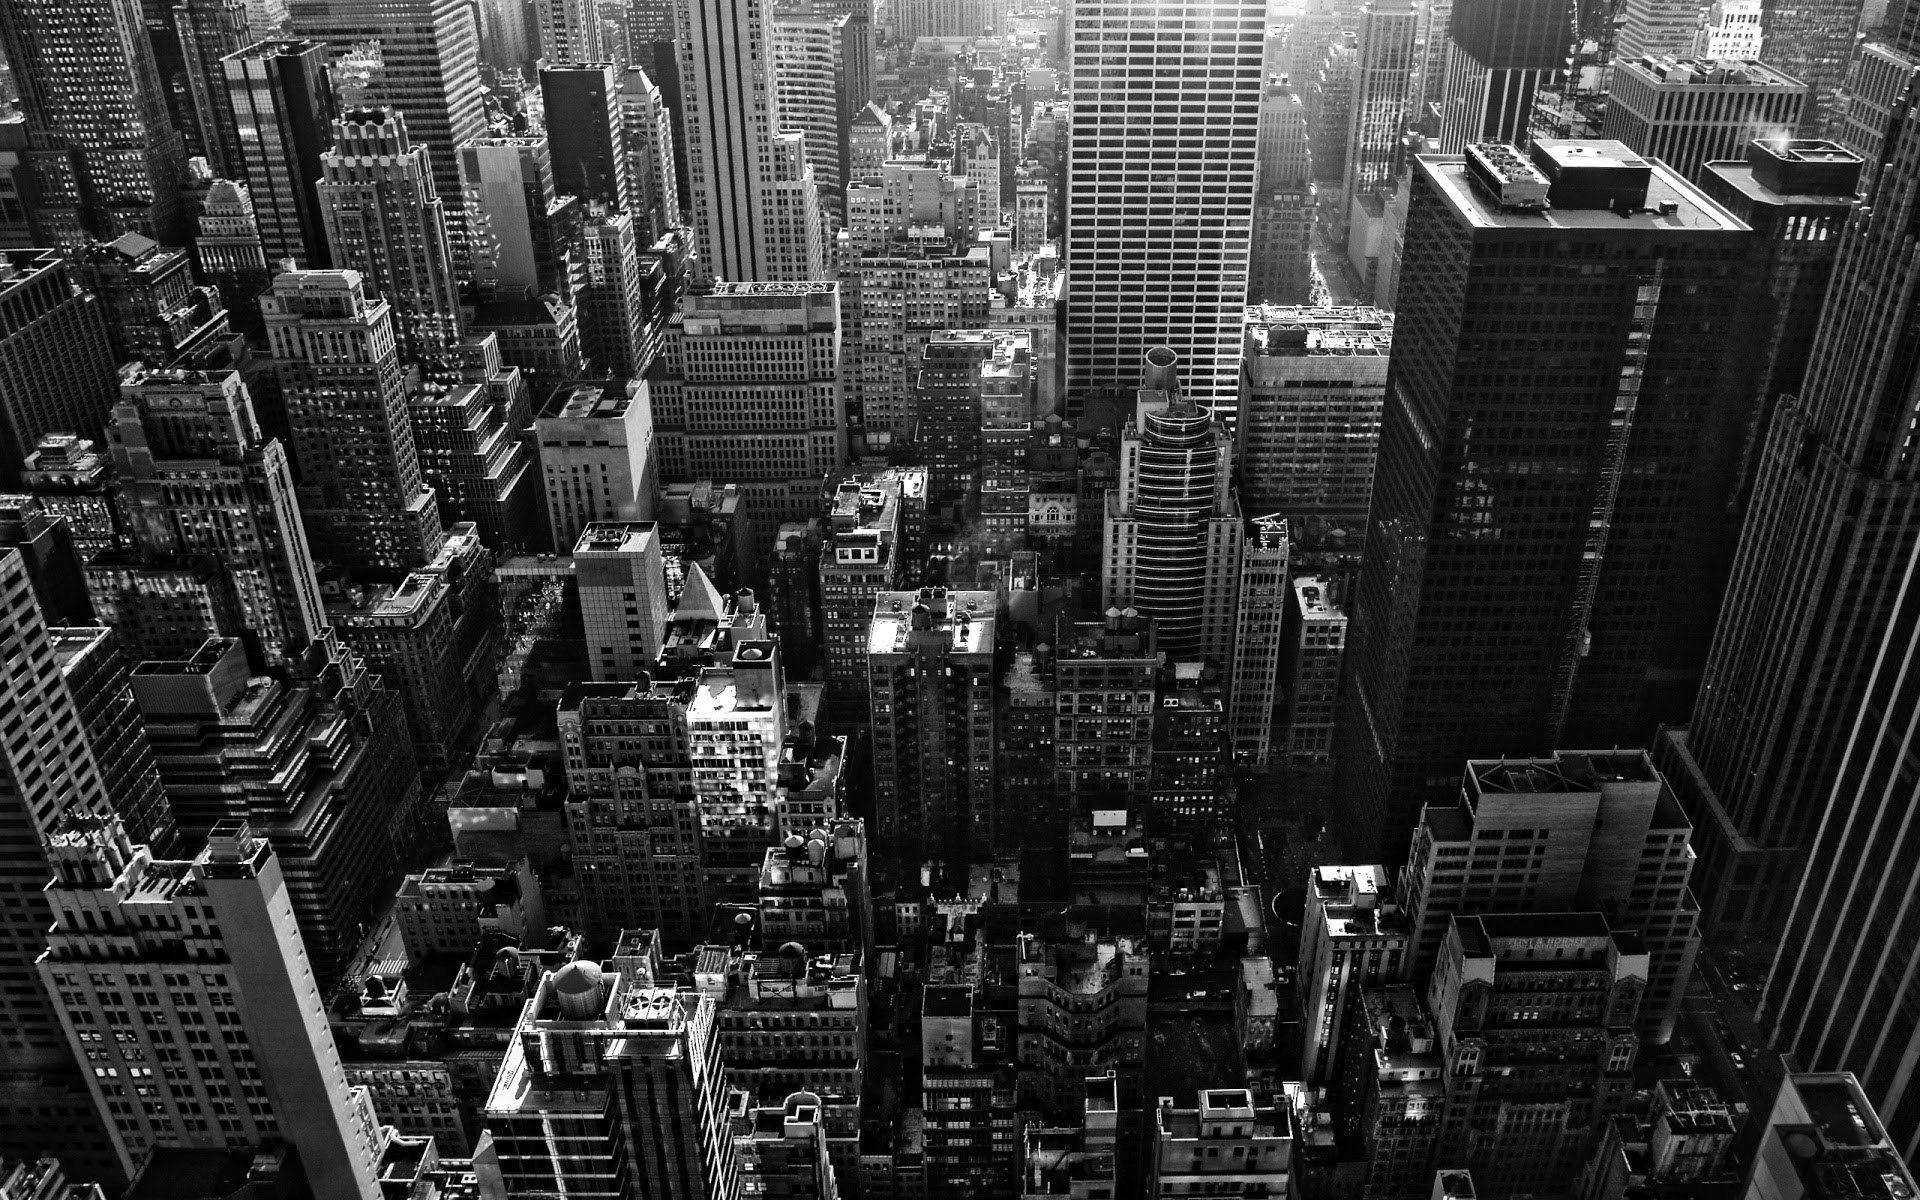 1920s Desktop Wallpaper City Wallpaper New York Wallpaper Cityscape